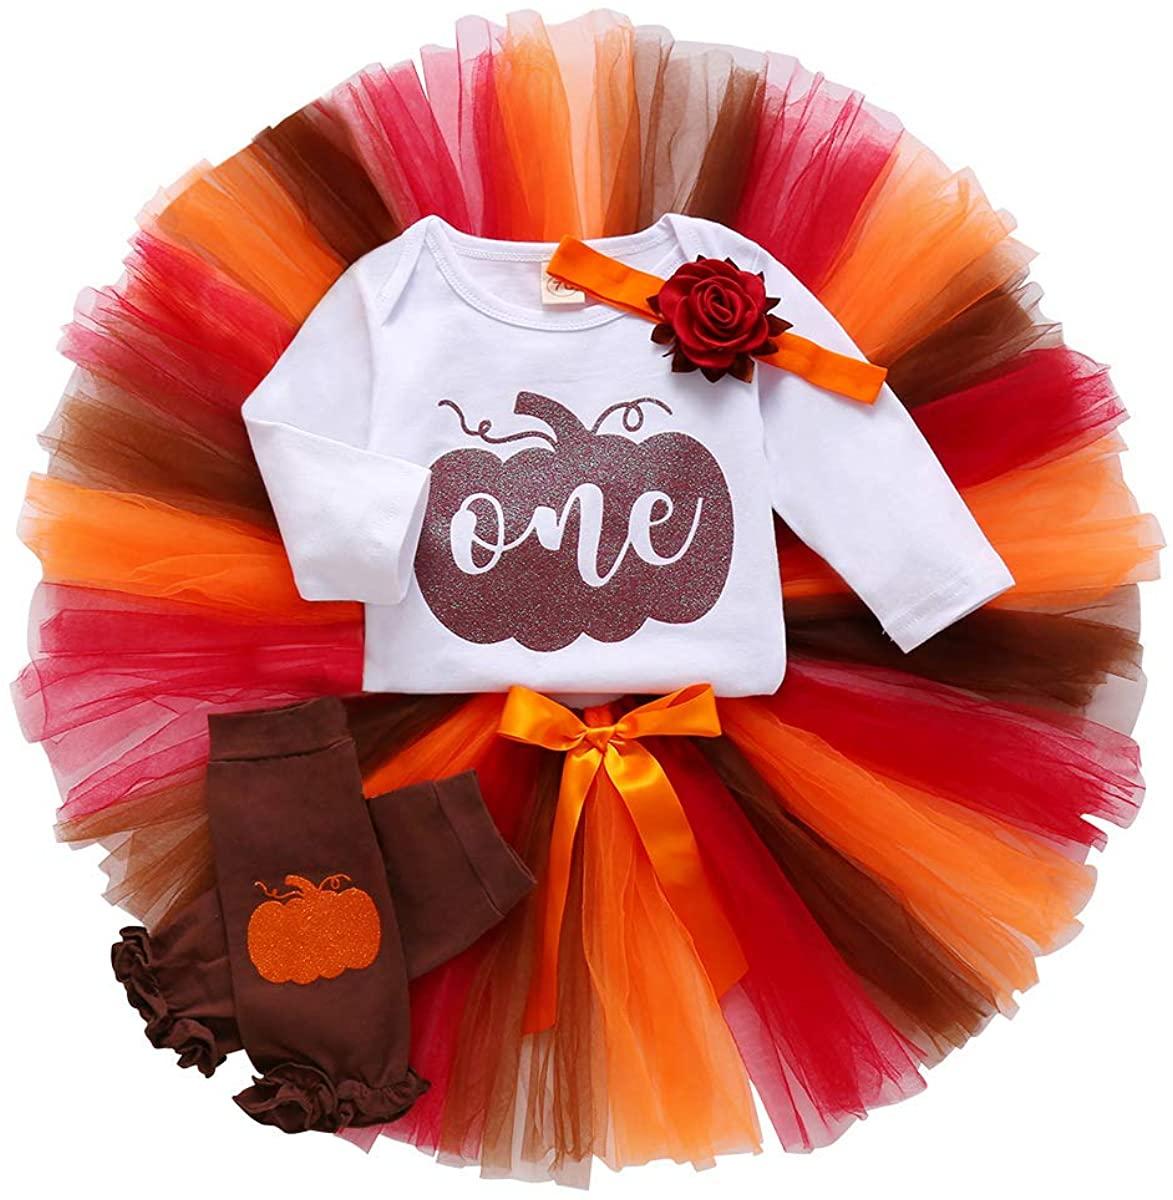 Halloween Baby Girl Outfits 1st Birthday Pumpkin Long Sleeve Romper Tulle Tutu Skirt Headband Leg Warmers 4pcs Clothes Set